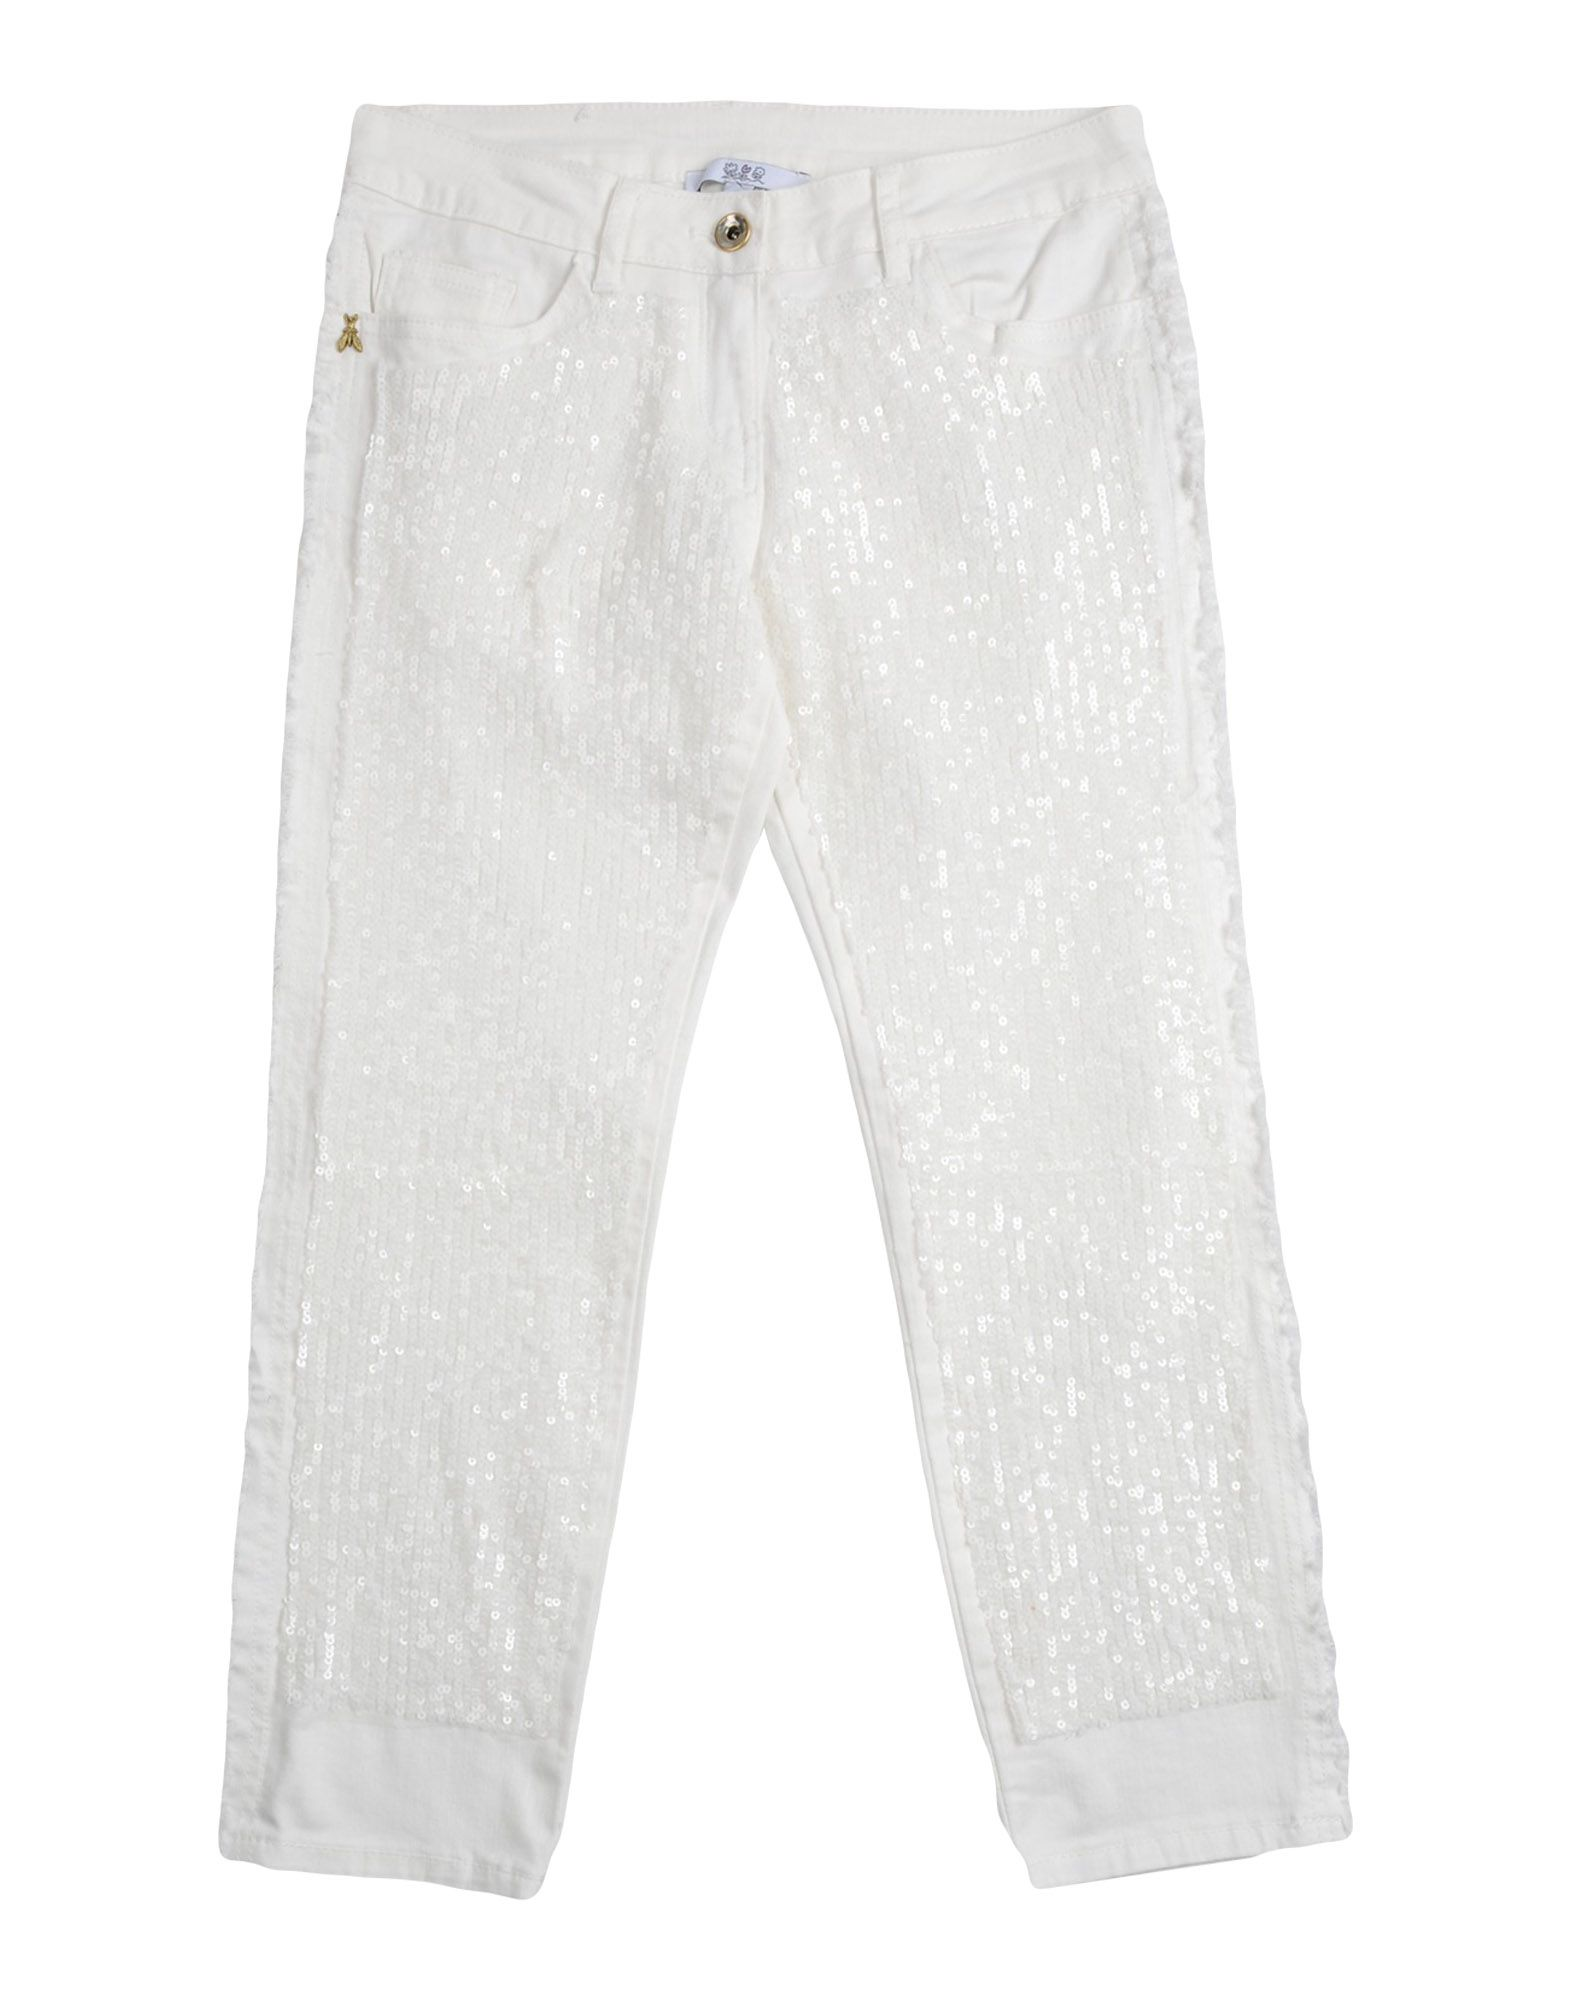 PATRIZIA PEPE Джинсовые брюки